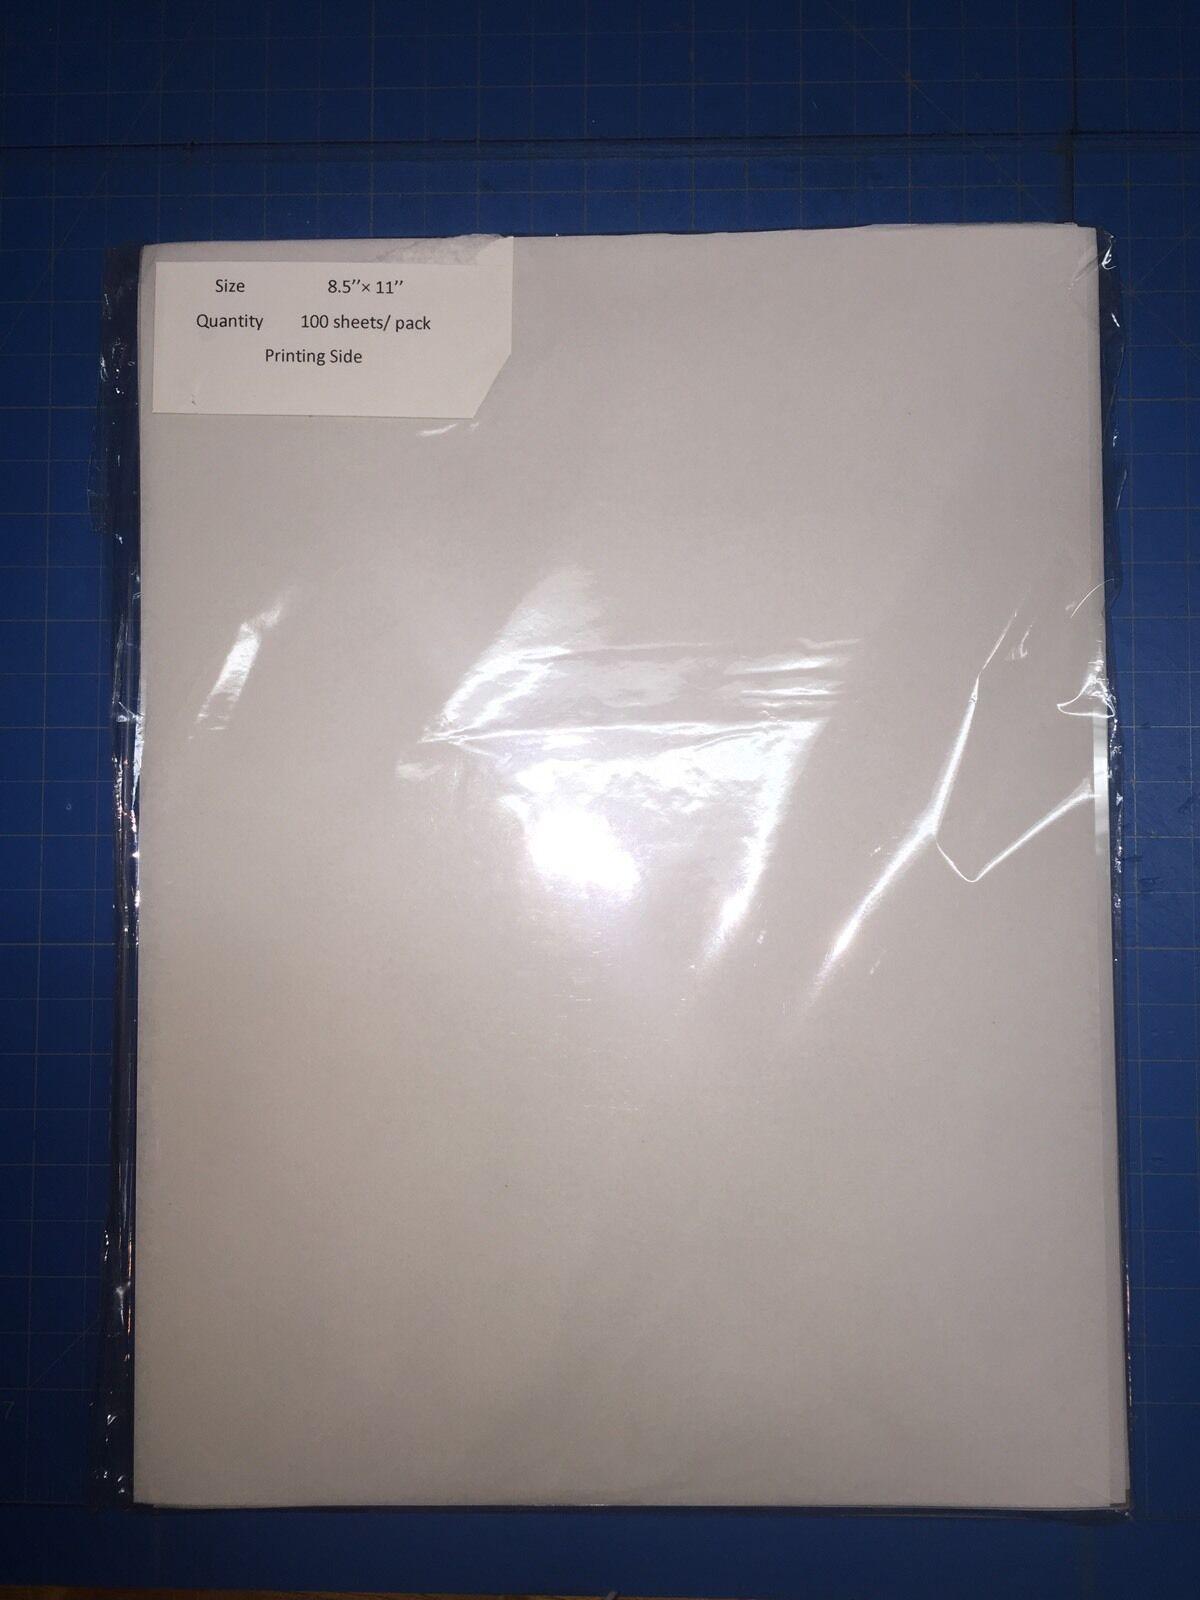 Premium Transparency Film Inkjet Paper Pack Of 100 Sheets...